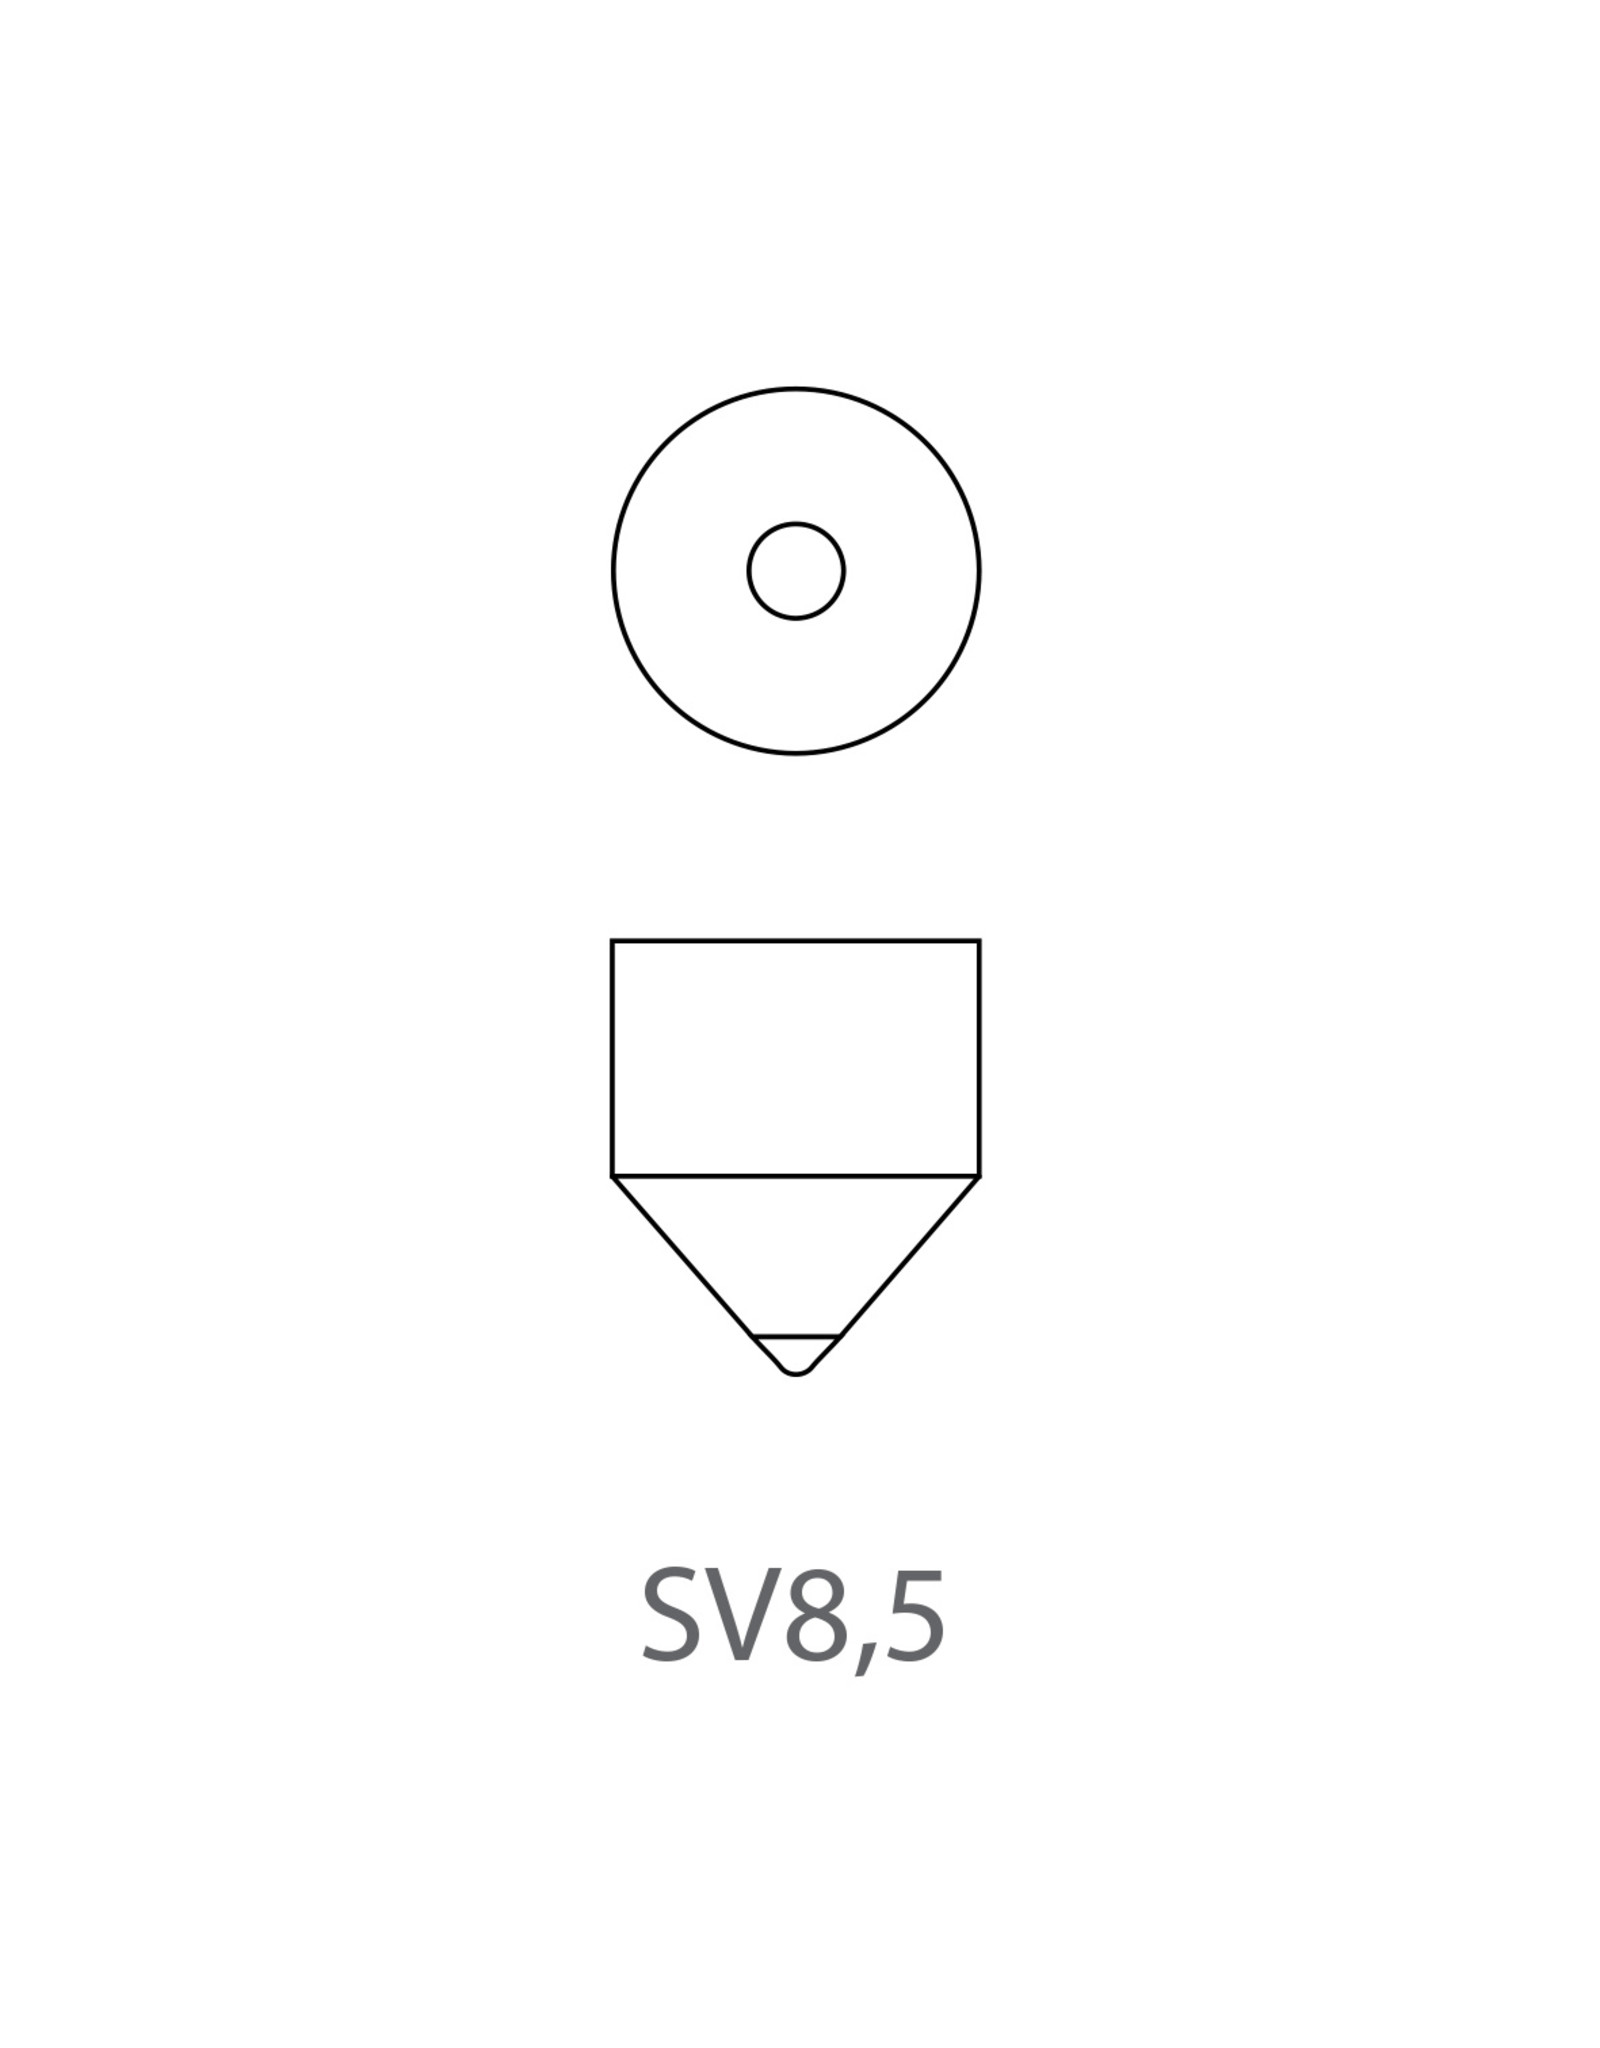 Autolamp 12V 18W SV8,5 15,5x43 2x